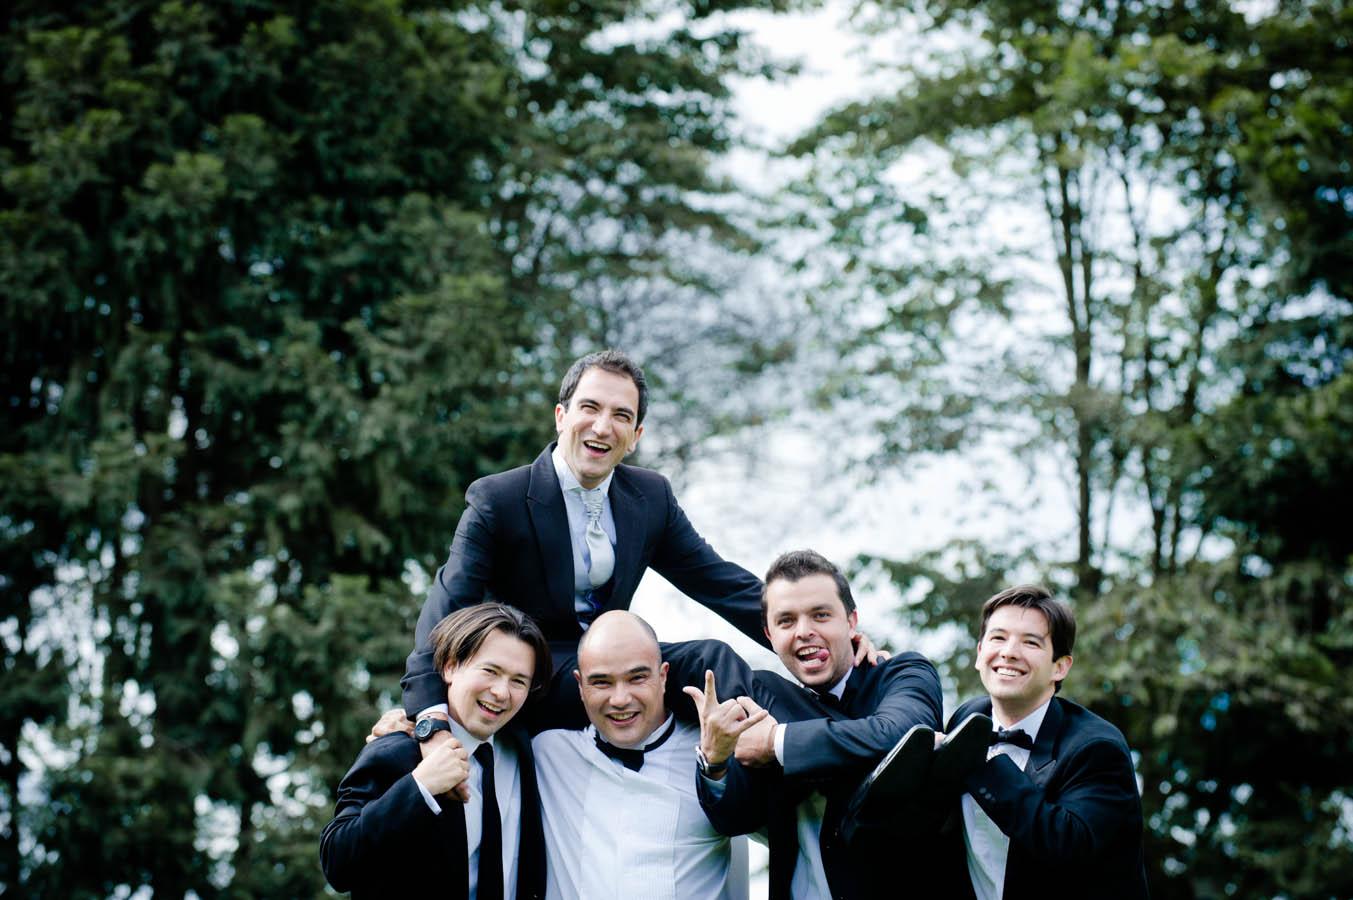 boda en hacienda pozo chico 02